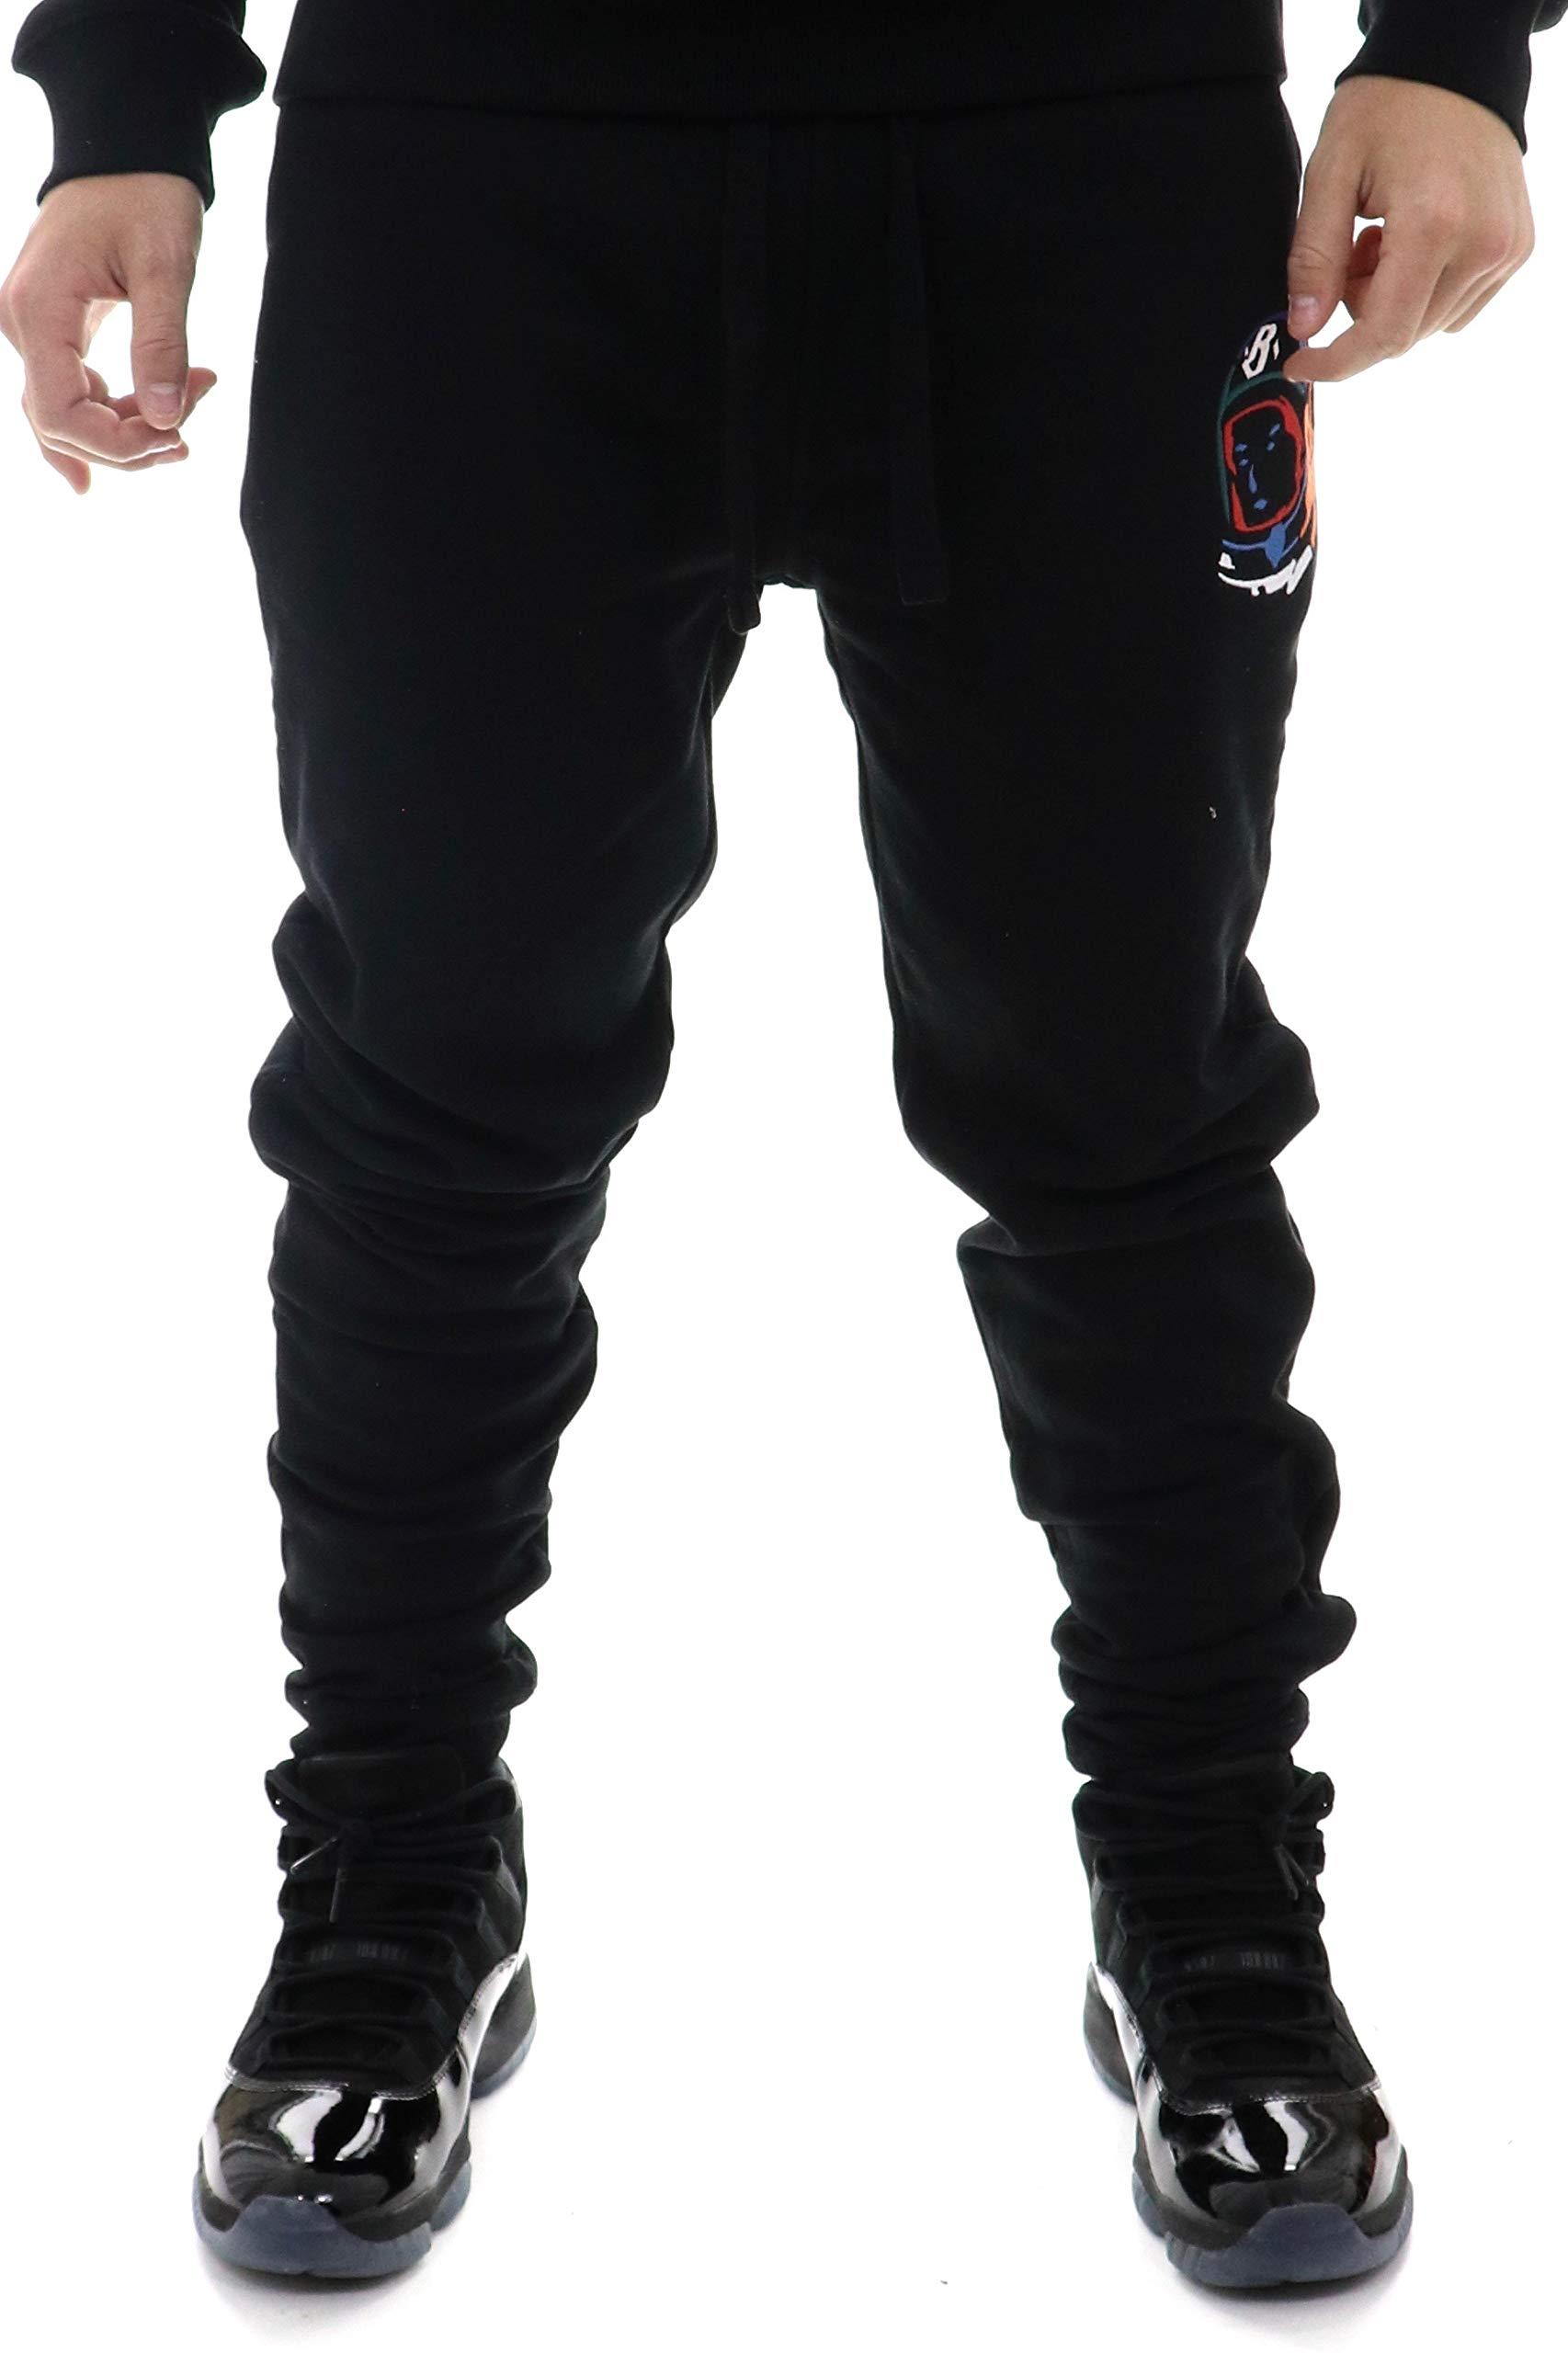 Billionaire Boys Club BB Multi Sweatpant in Heather Grey & Black 891-2108 (Black, Small)